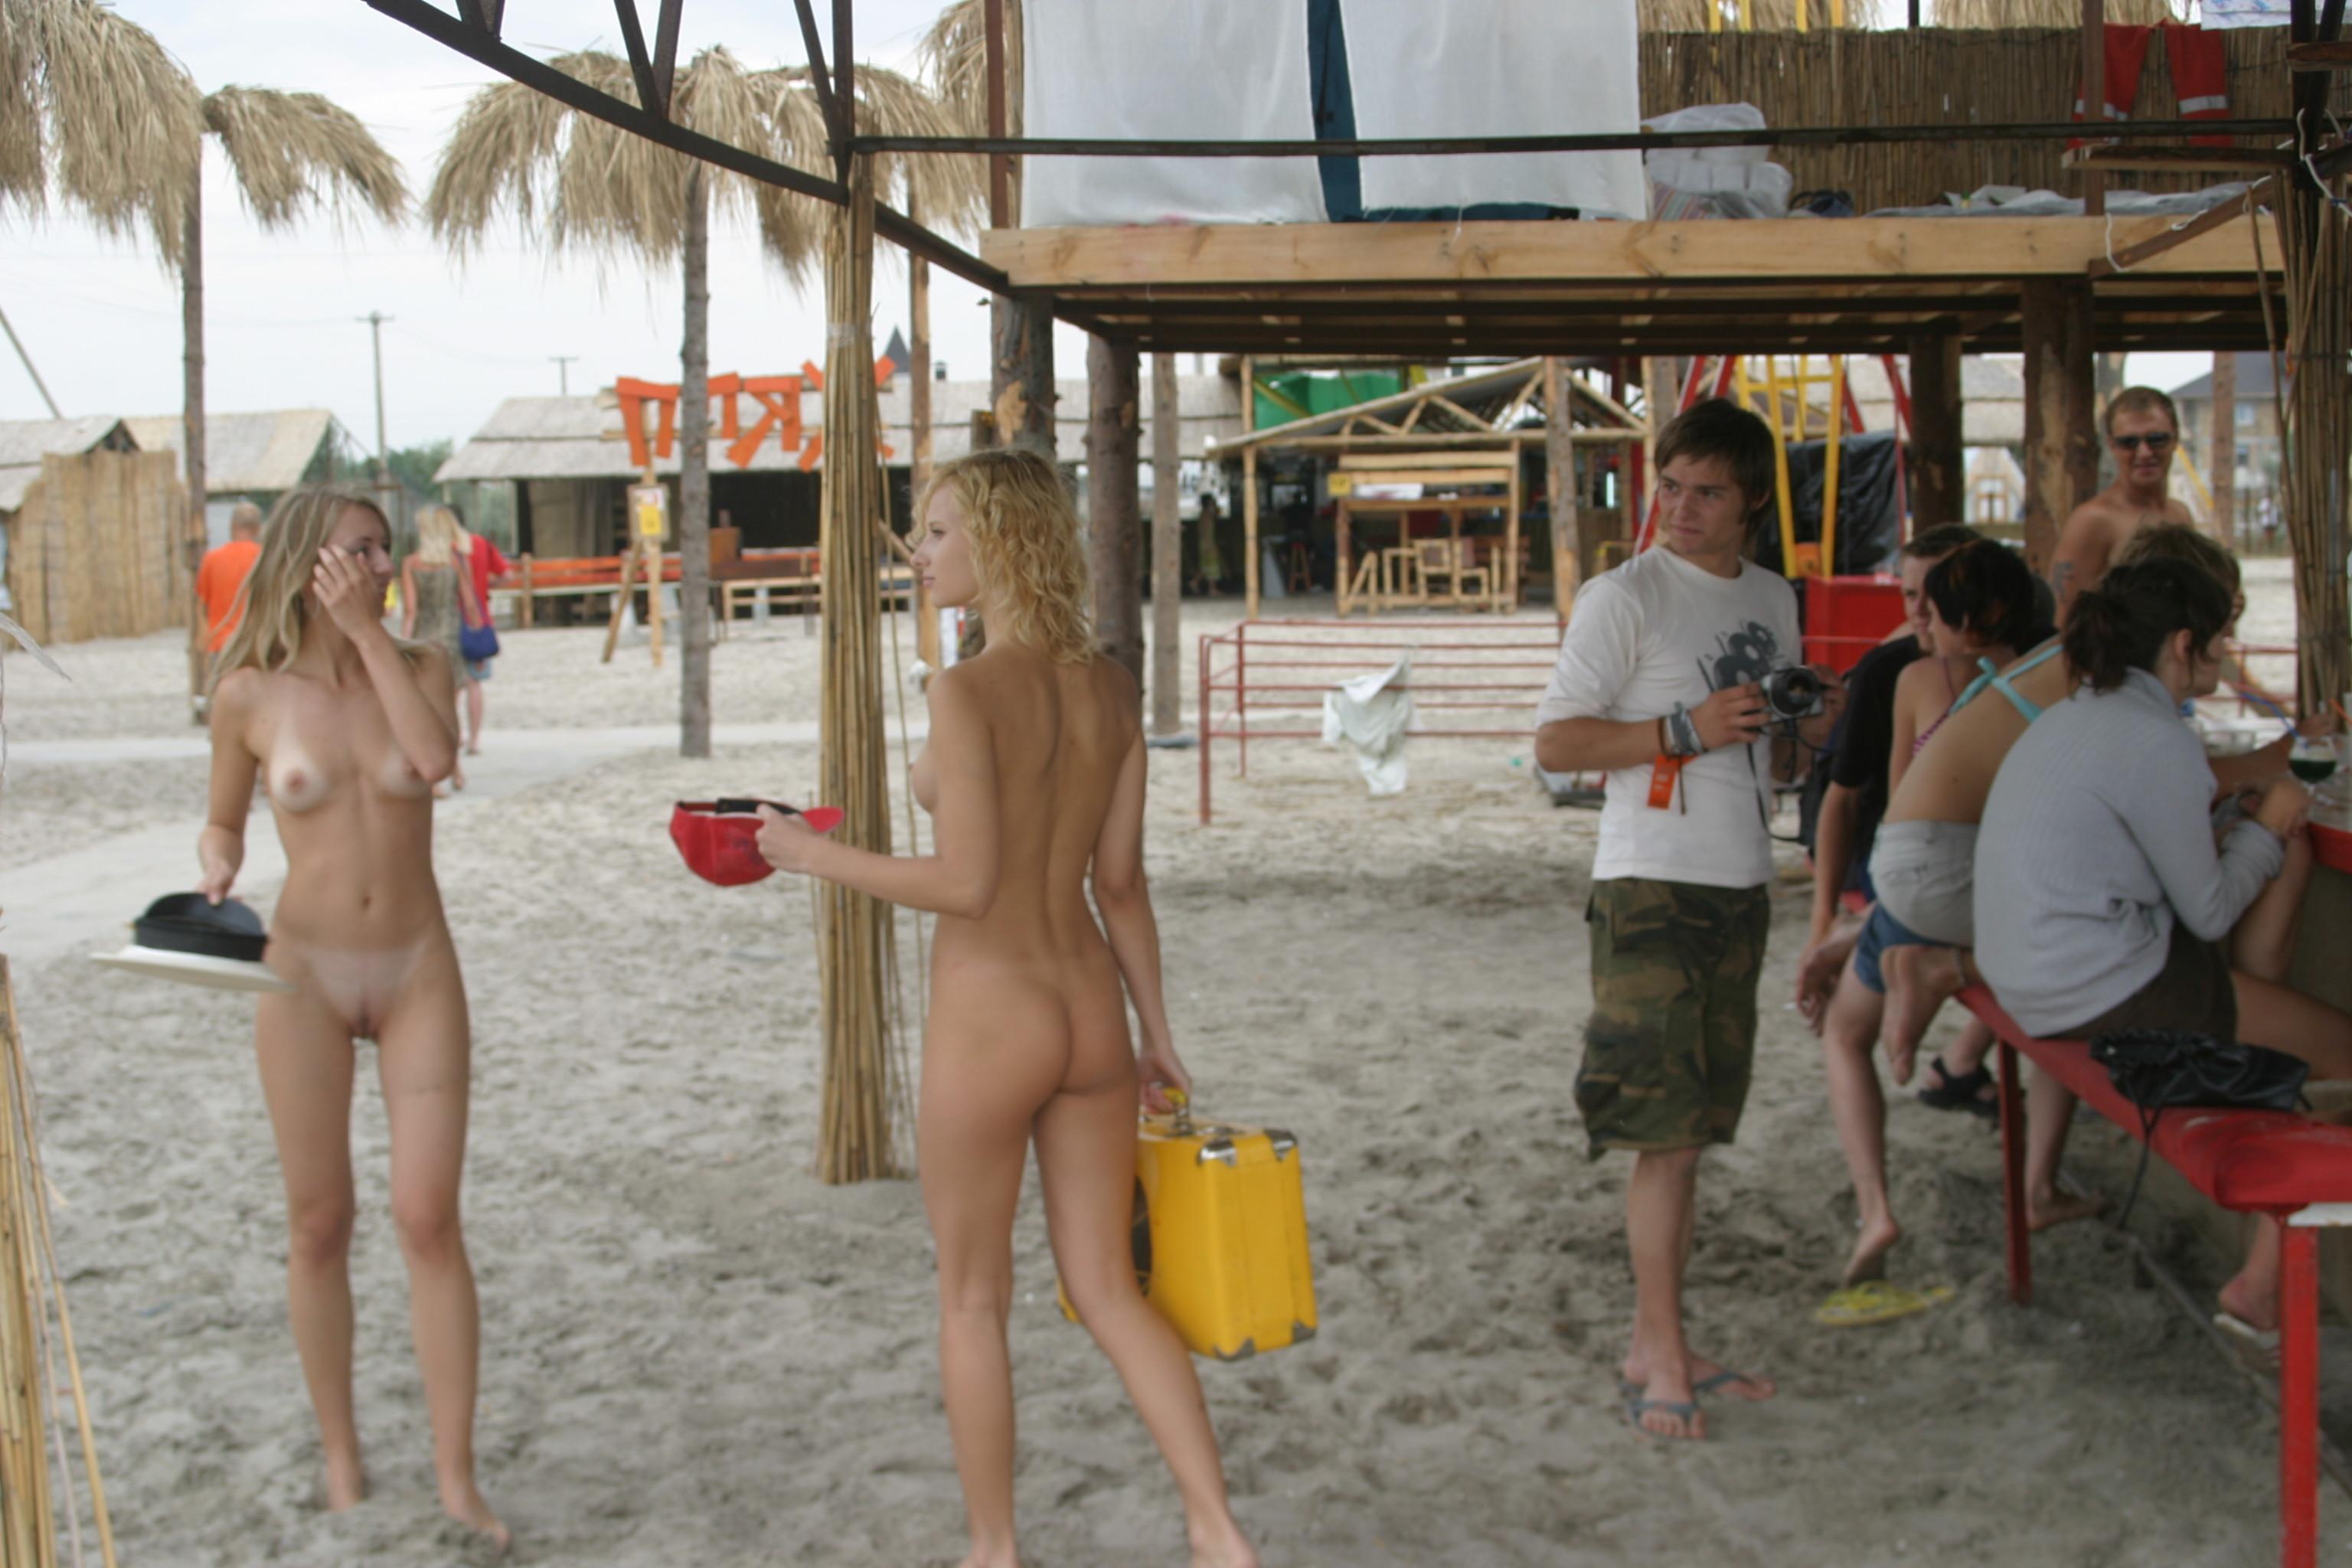 vika-y-lena-l-beach-nude-in-public-metart-43